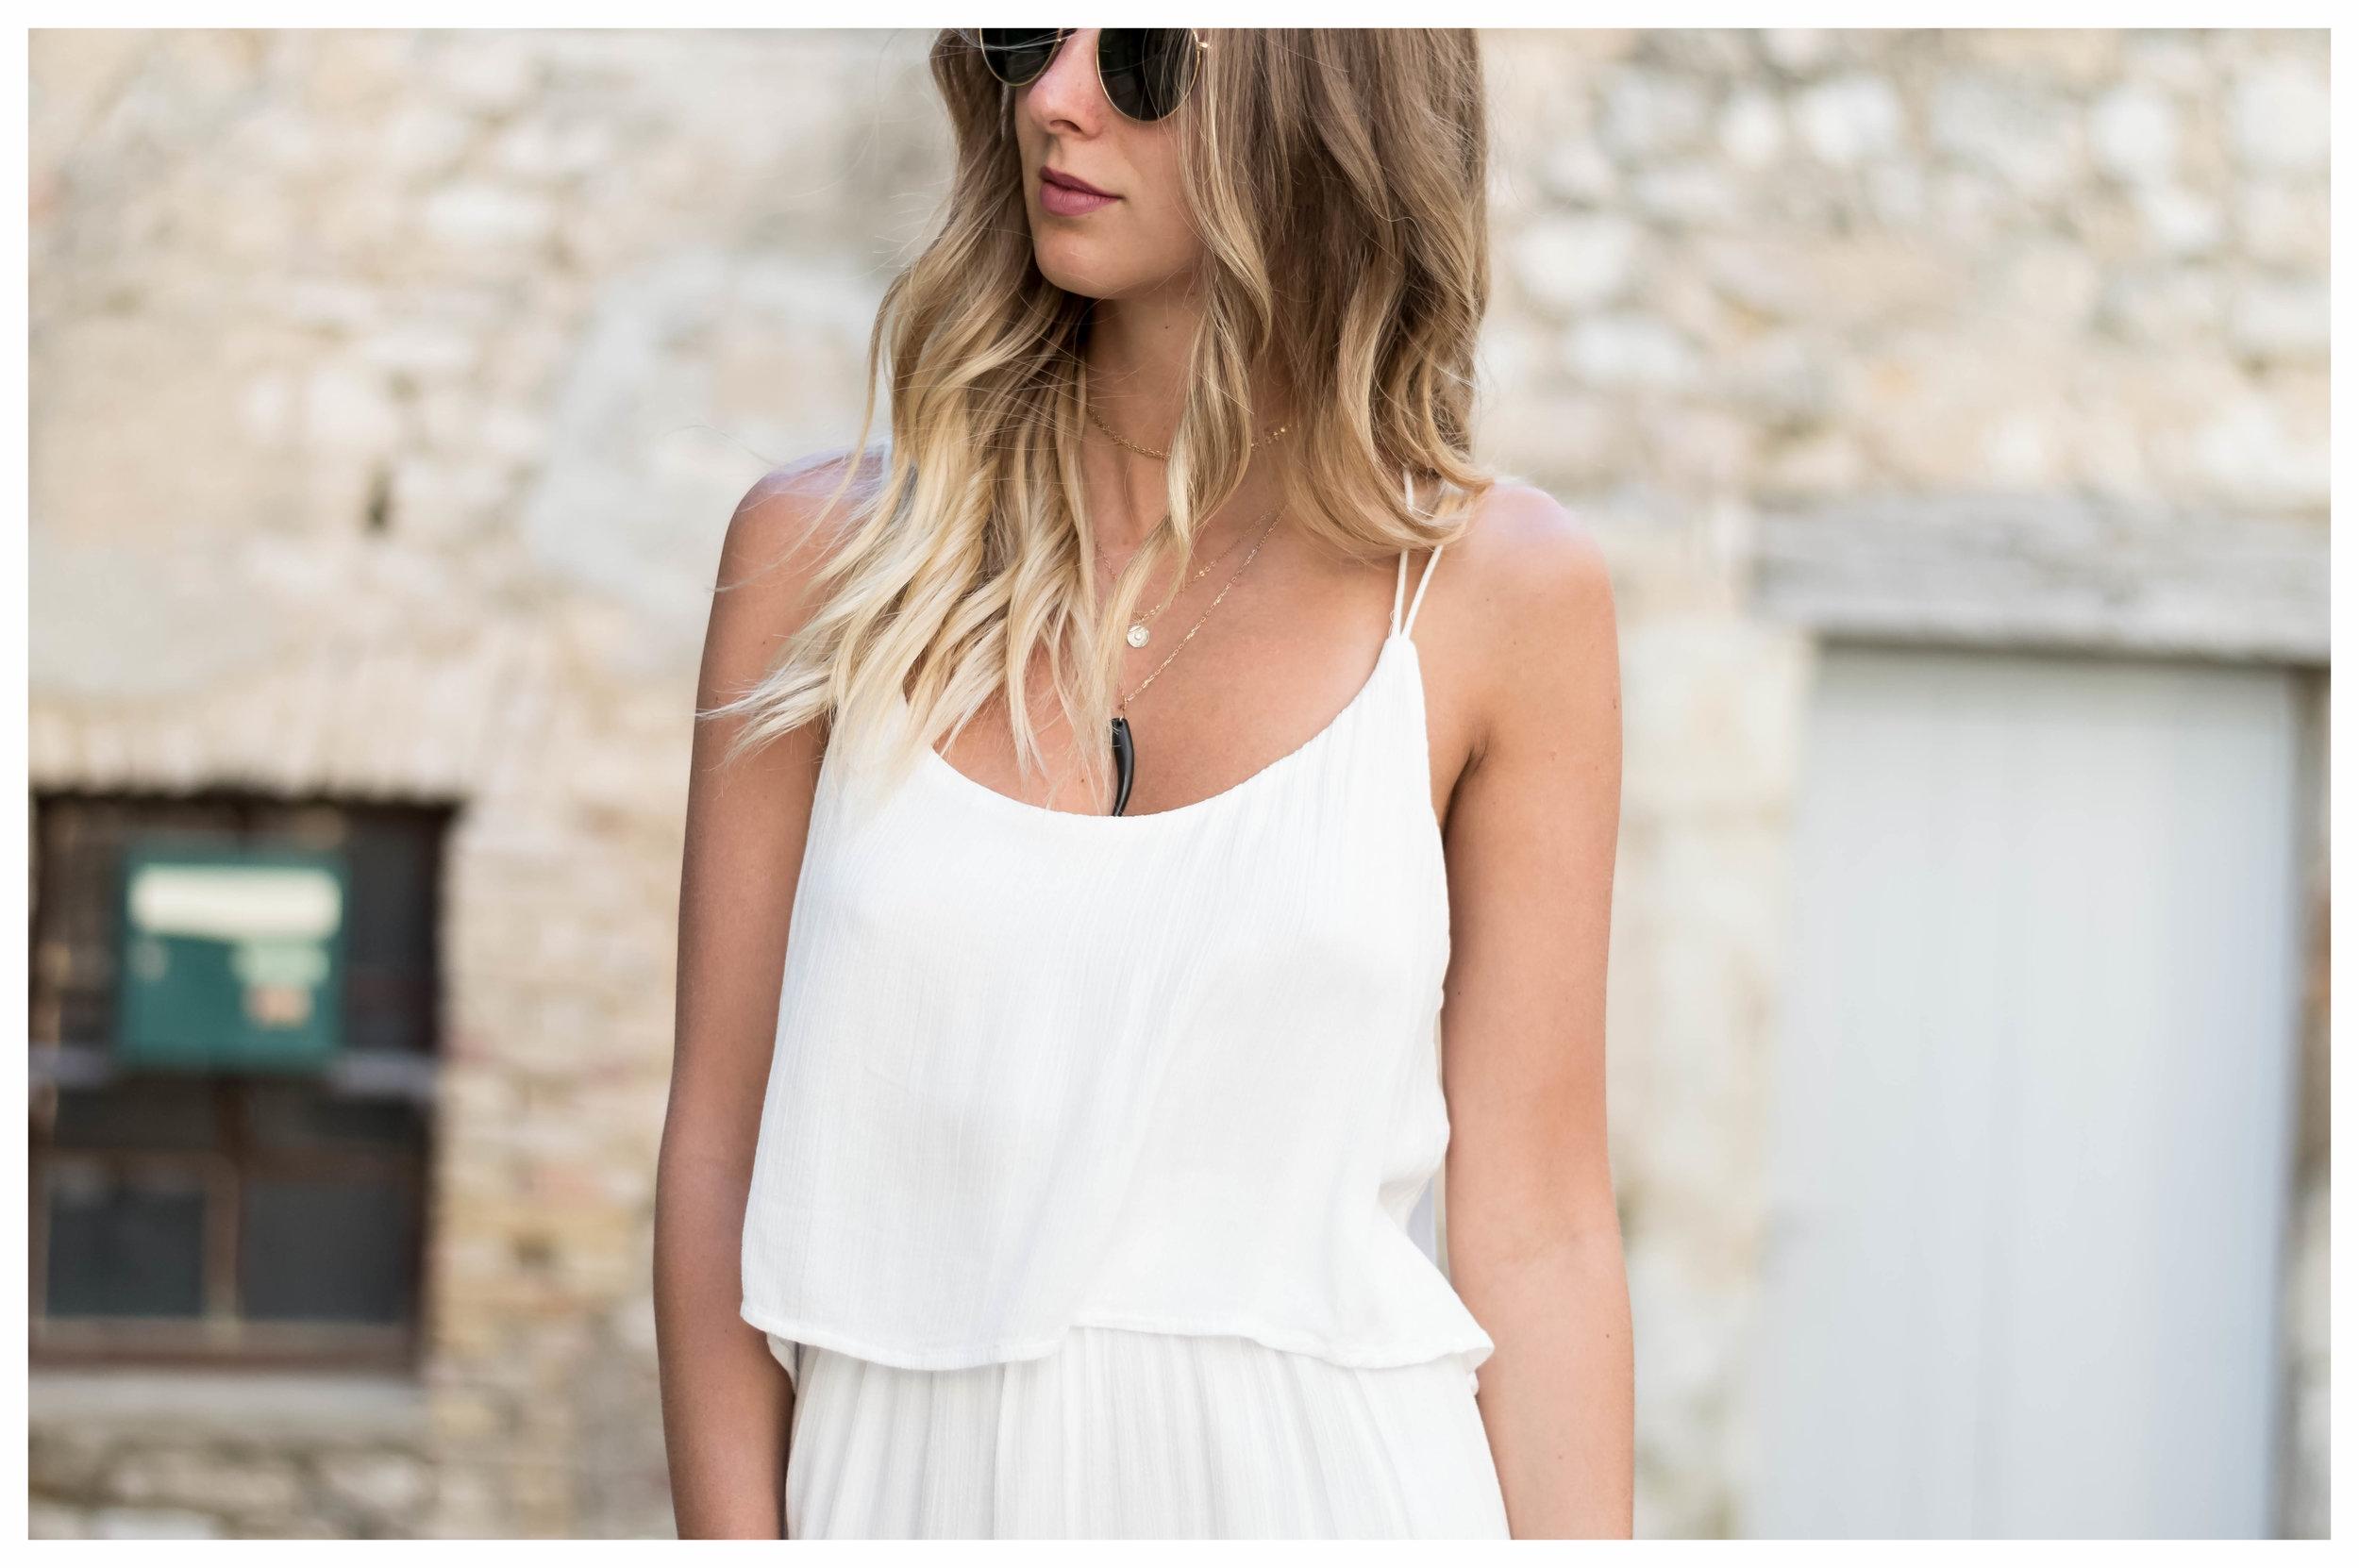 White Dress - OSIARAH.COM (8 sur 16).jpg